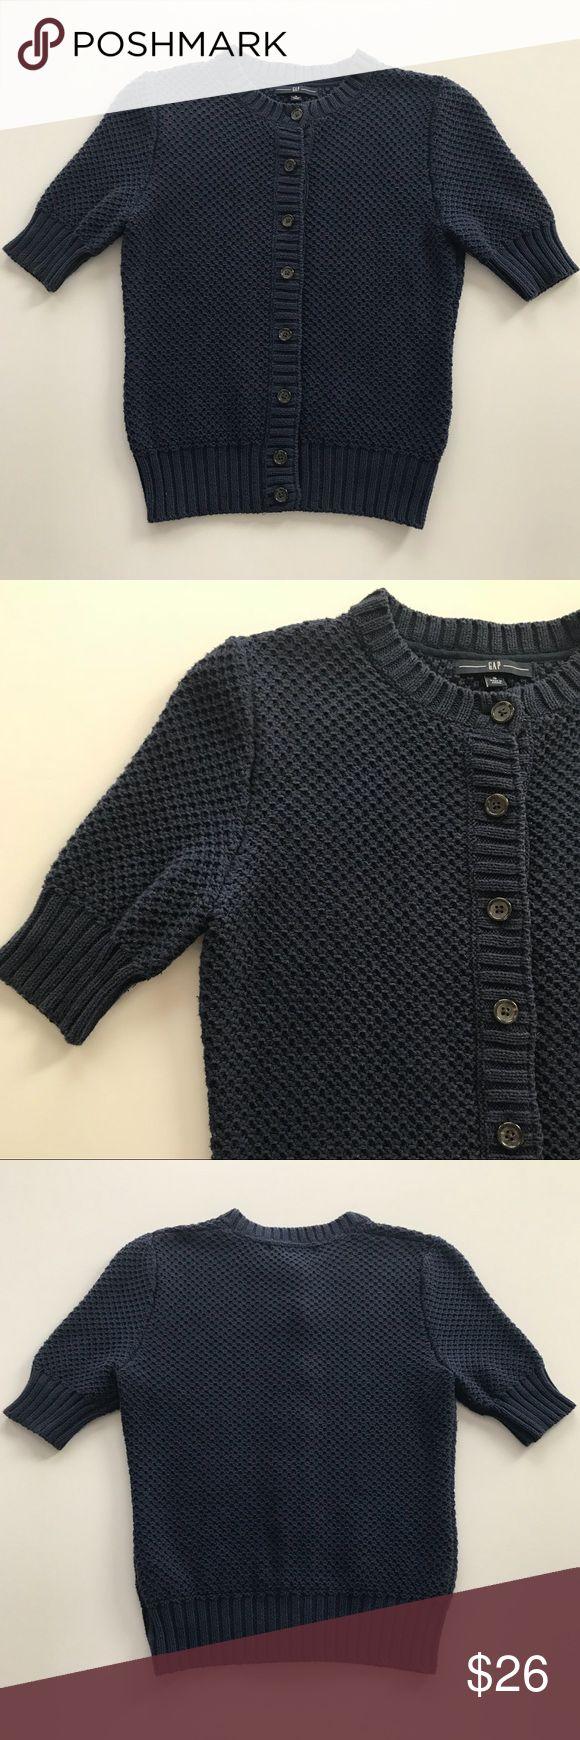 Best 25  Short sleeve cardigan ideas on Pinterest   Work casual ...